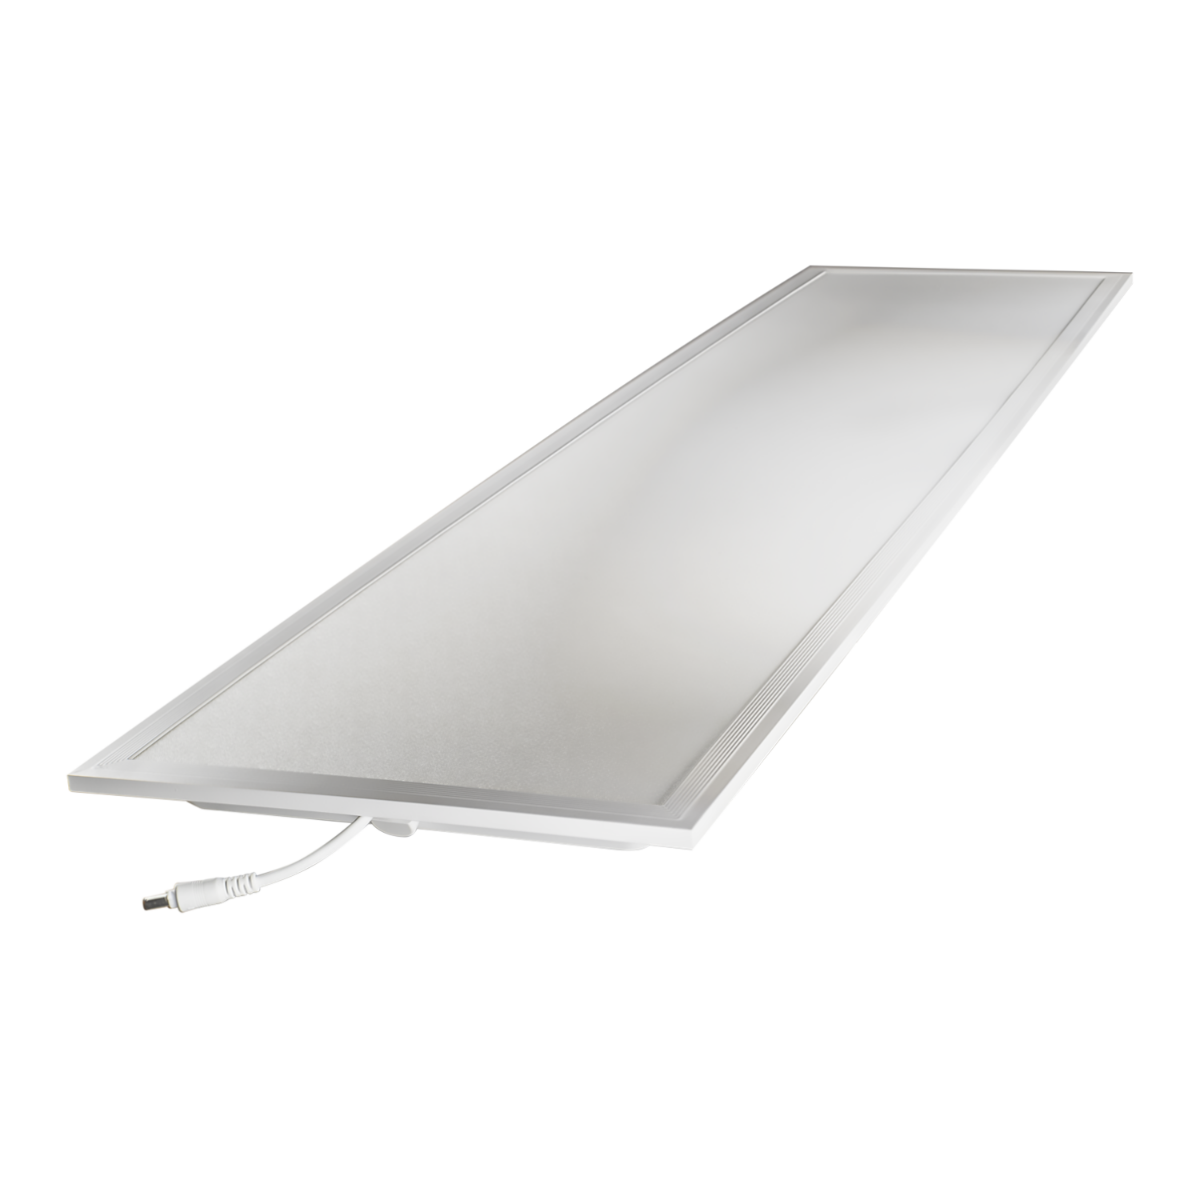 Noxion LED Panel Delta Pro Highlum V2.0 40W 30x120cm 3000K 5280lm UGR <19 | Warm White - Replaces 2x36W